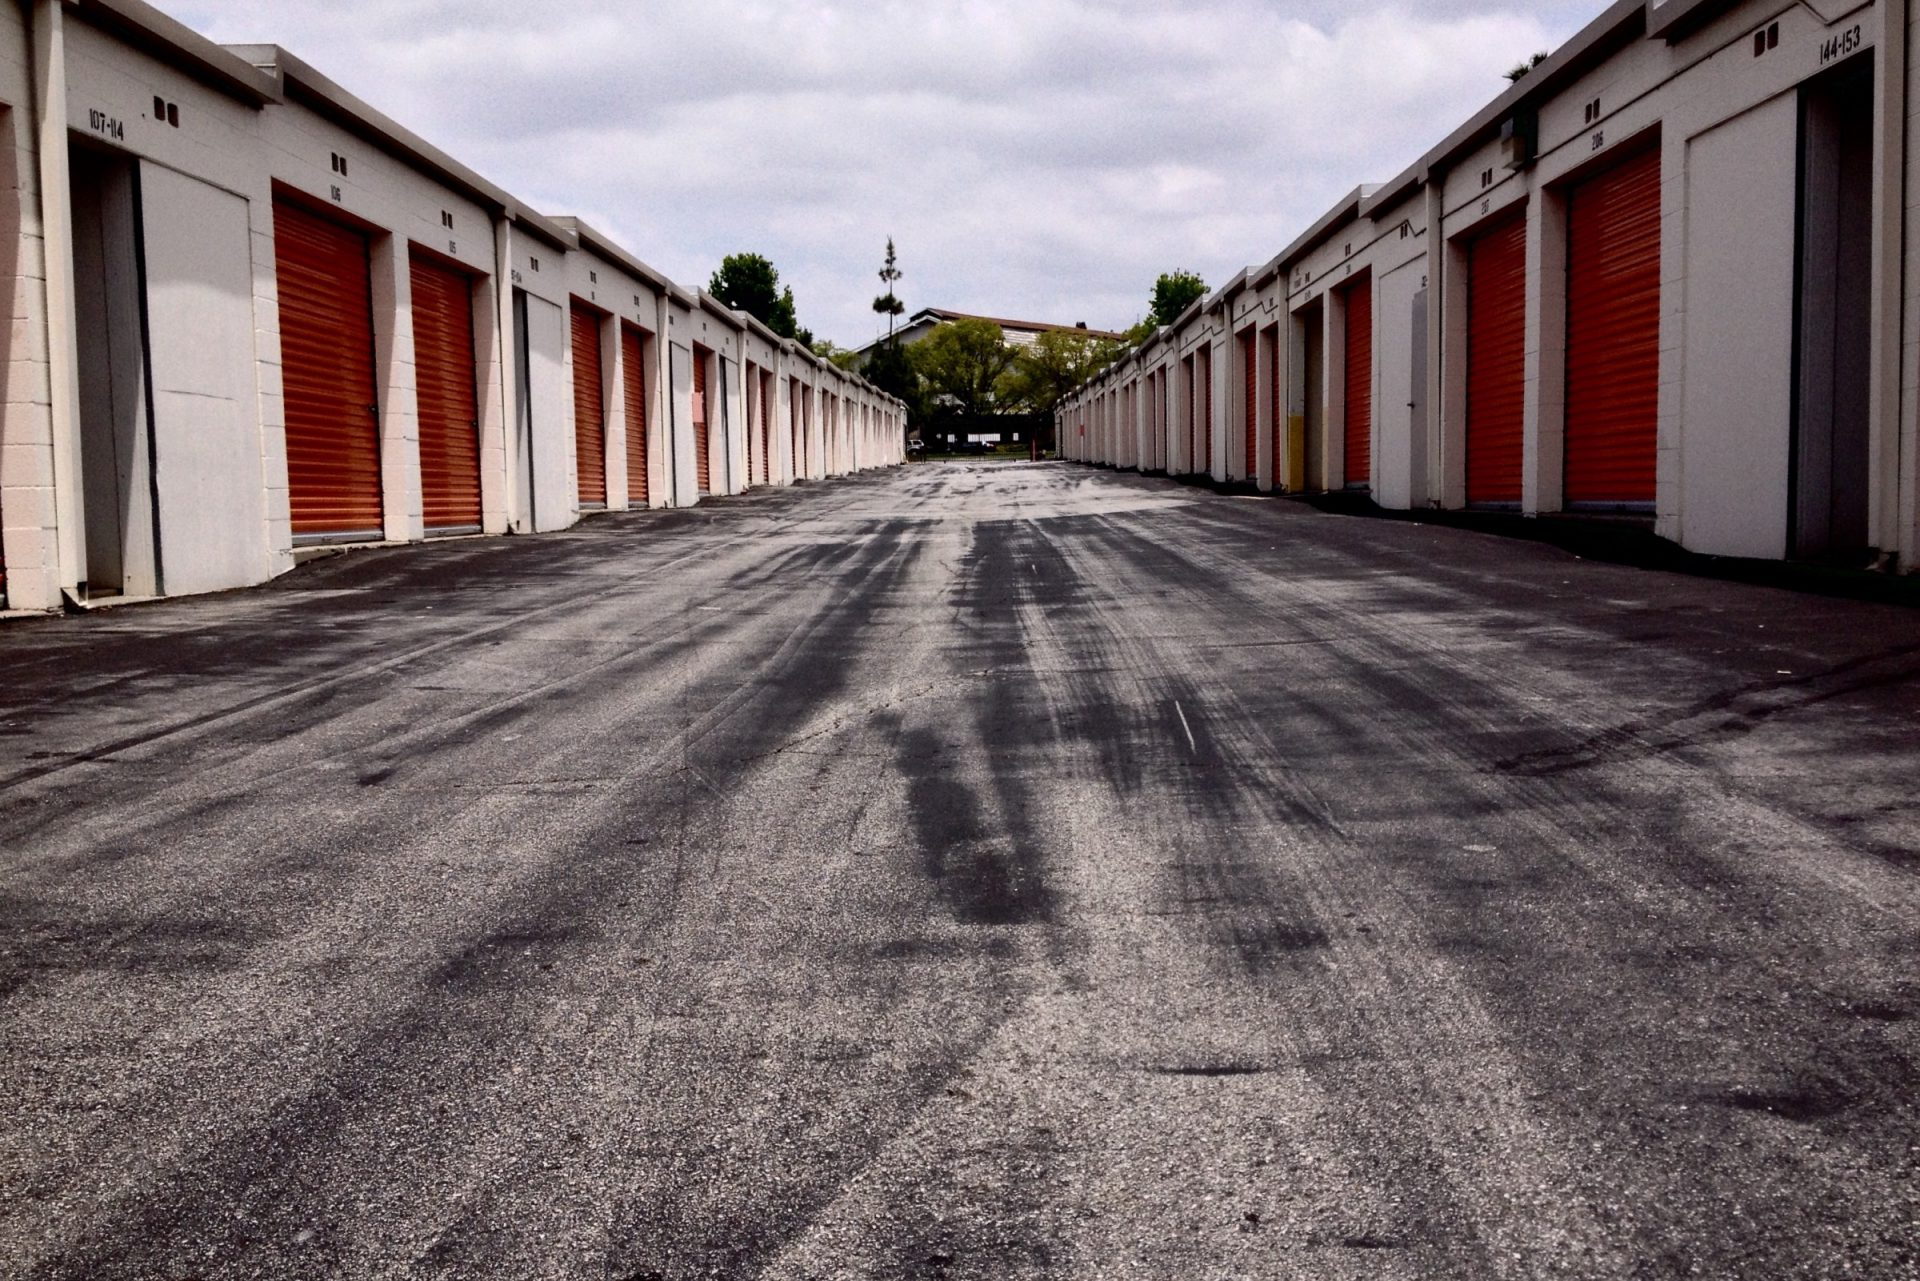 Concrete Pathway Between Storage Buildings